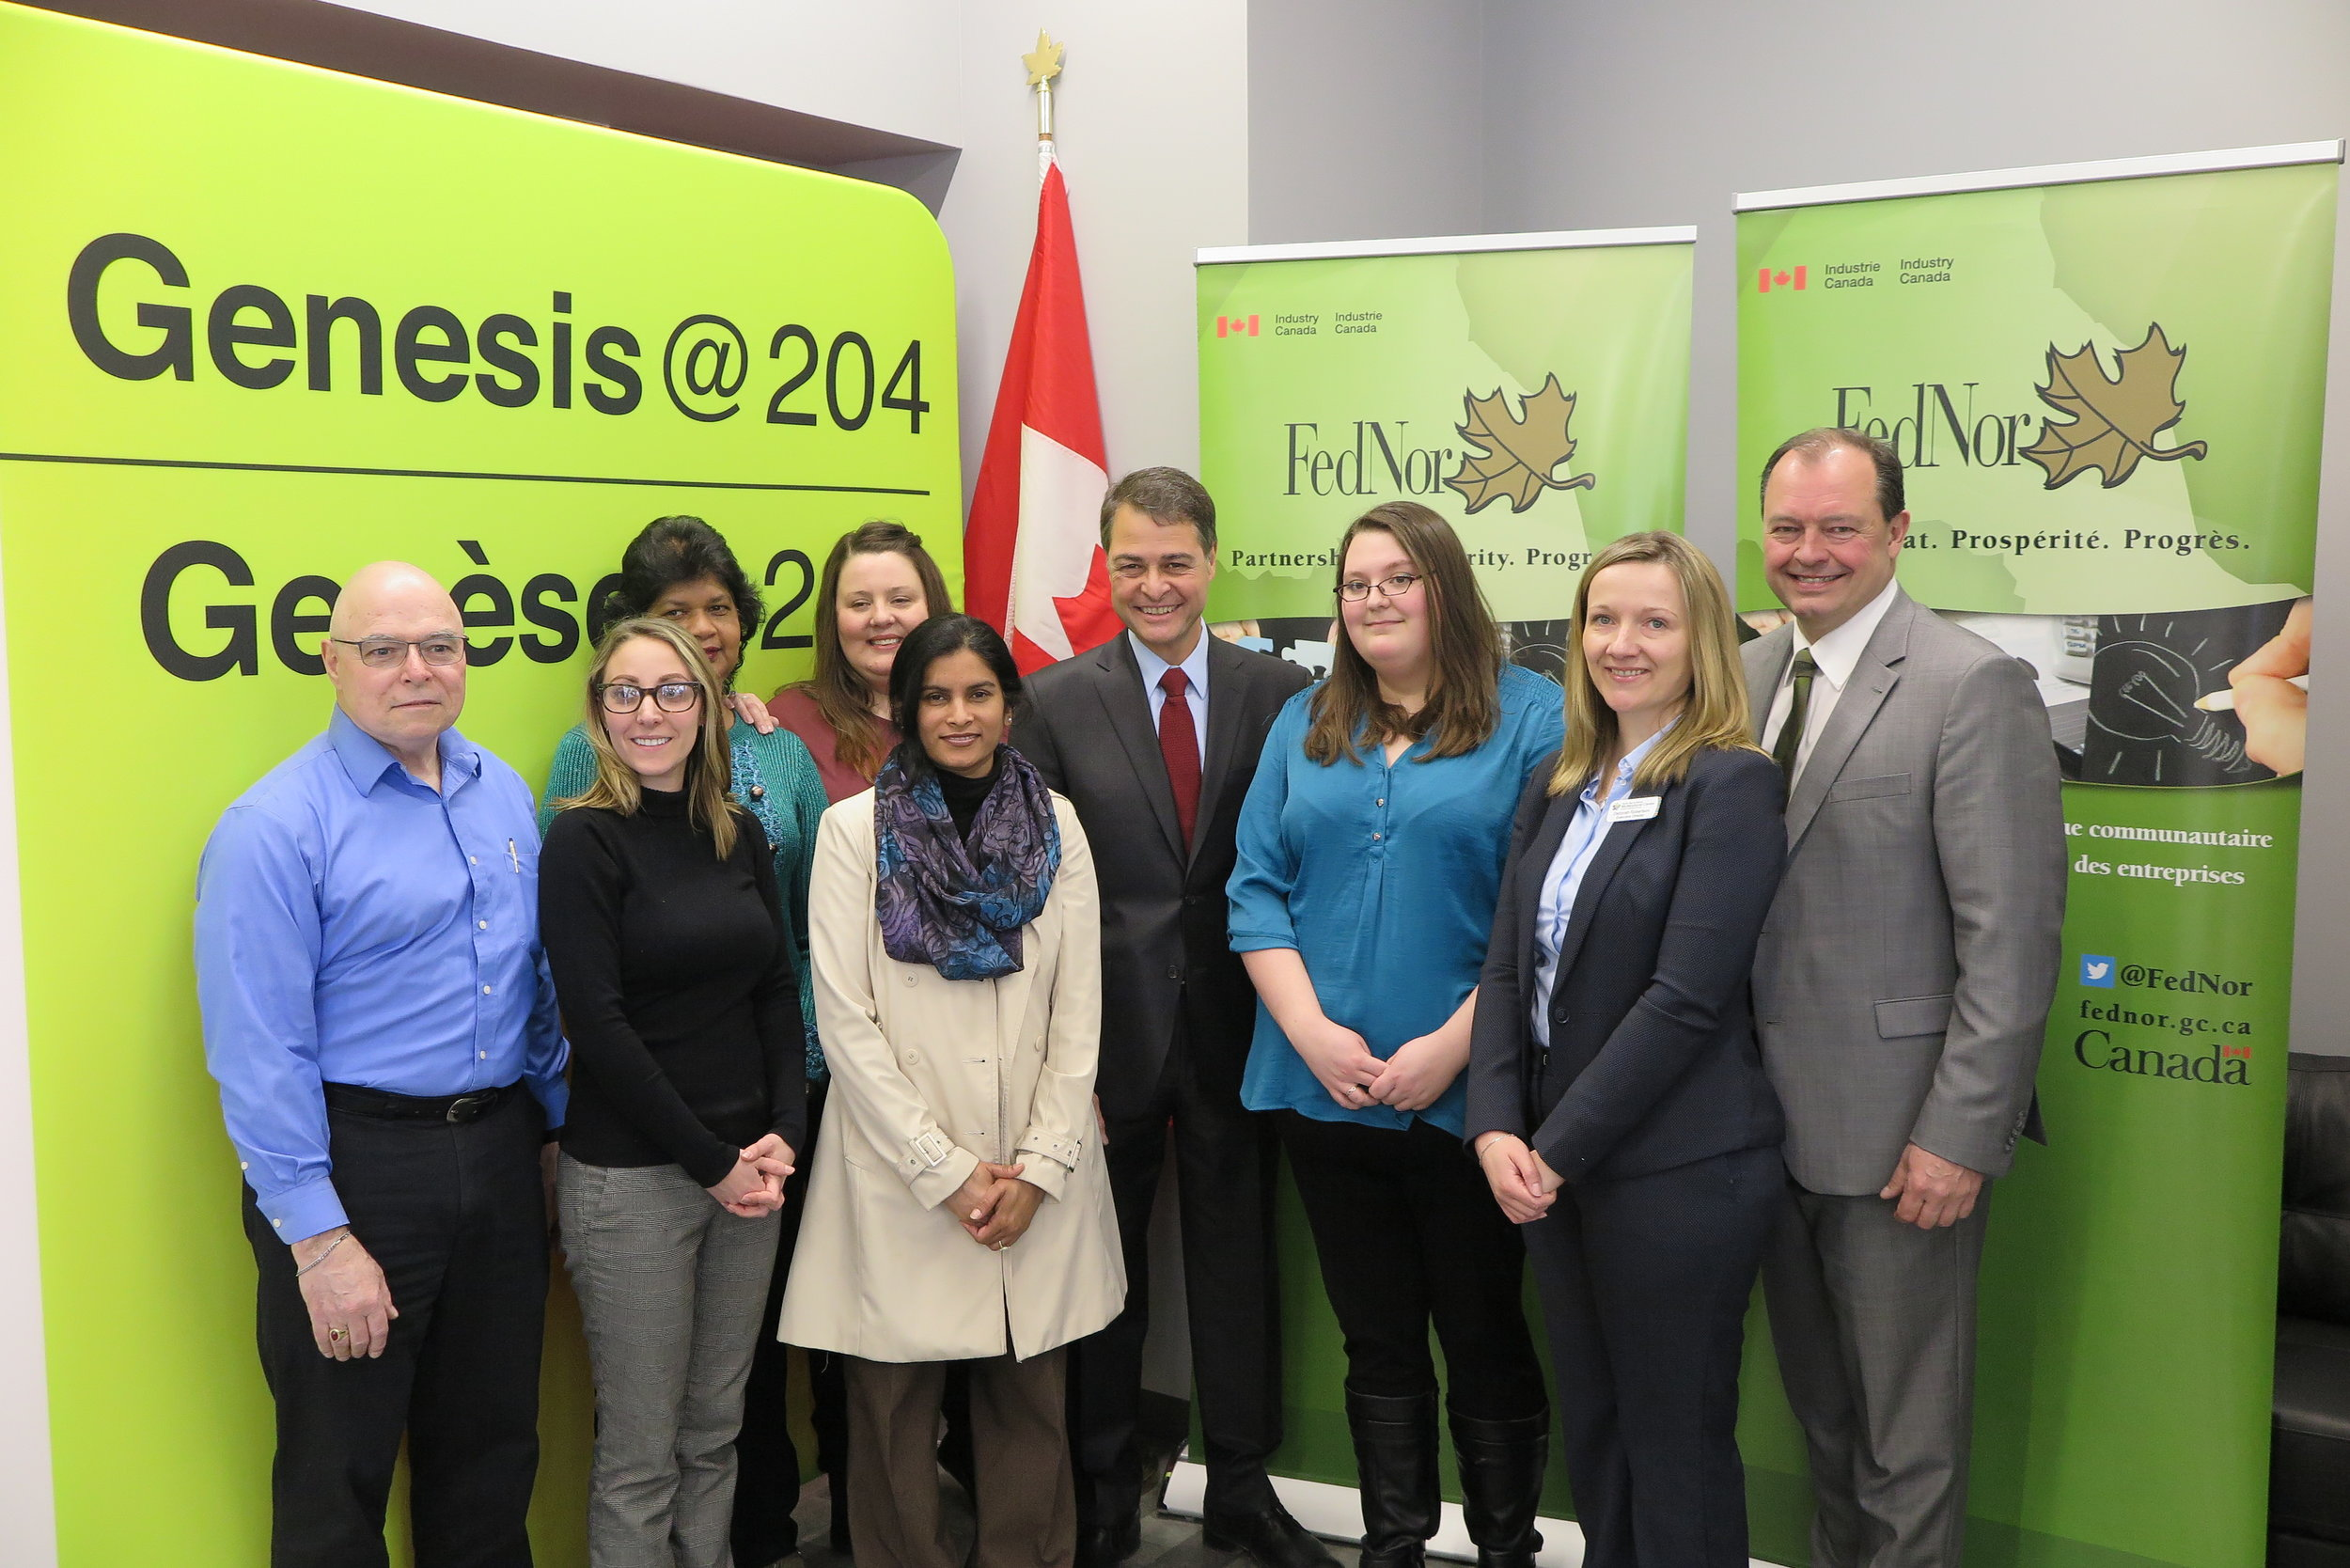 Genesis@204 Funding Announcement